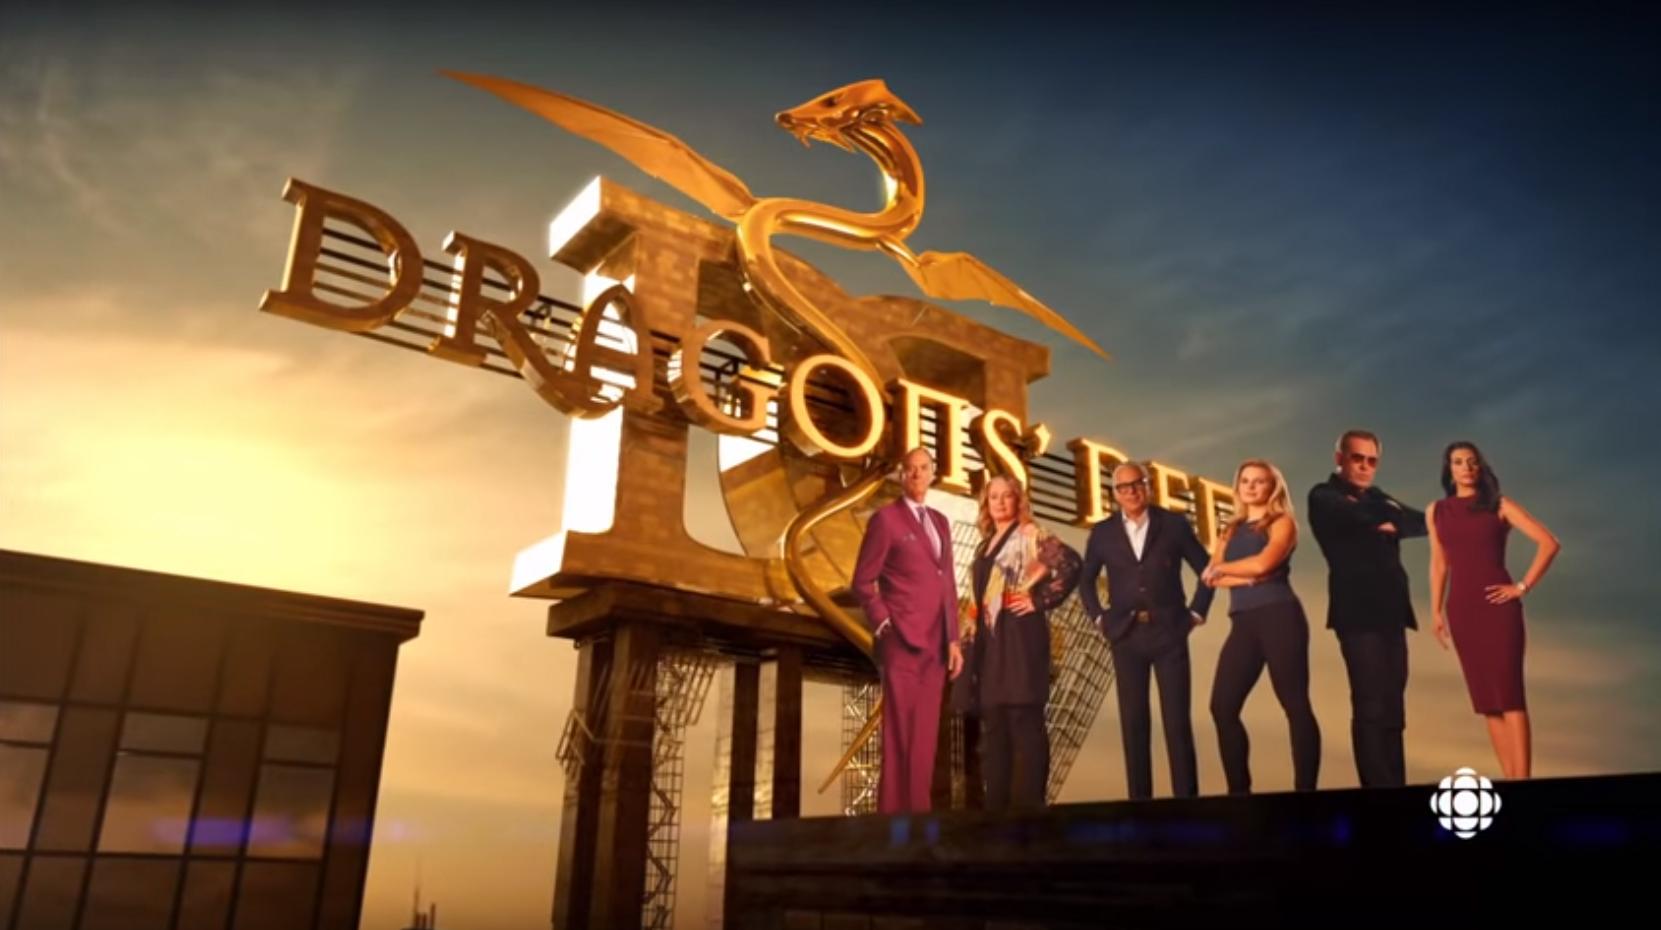 Neuro Reset wins big on Dragons' Den